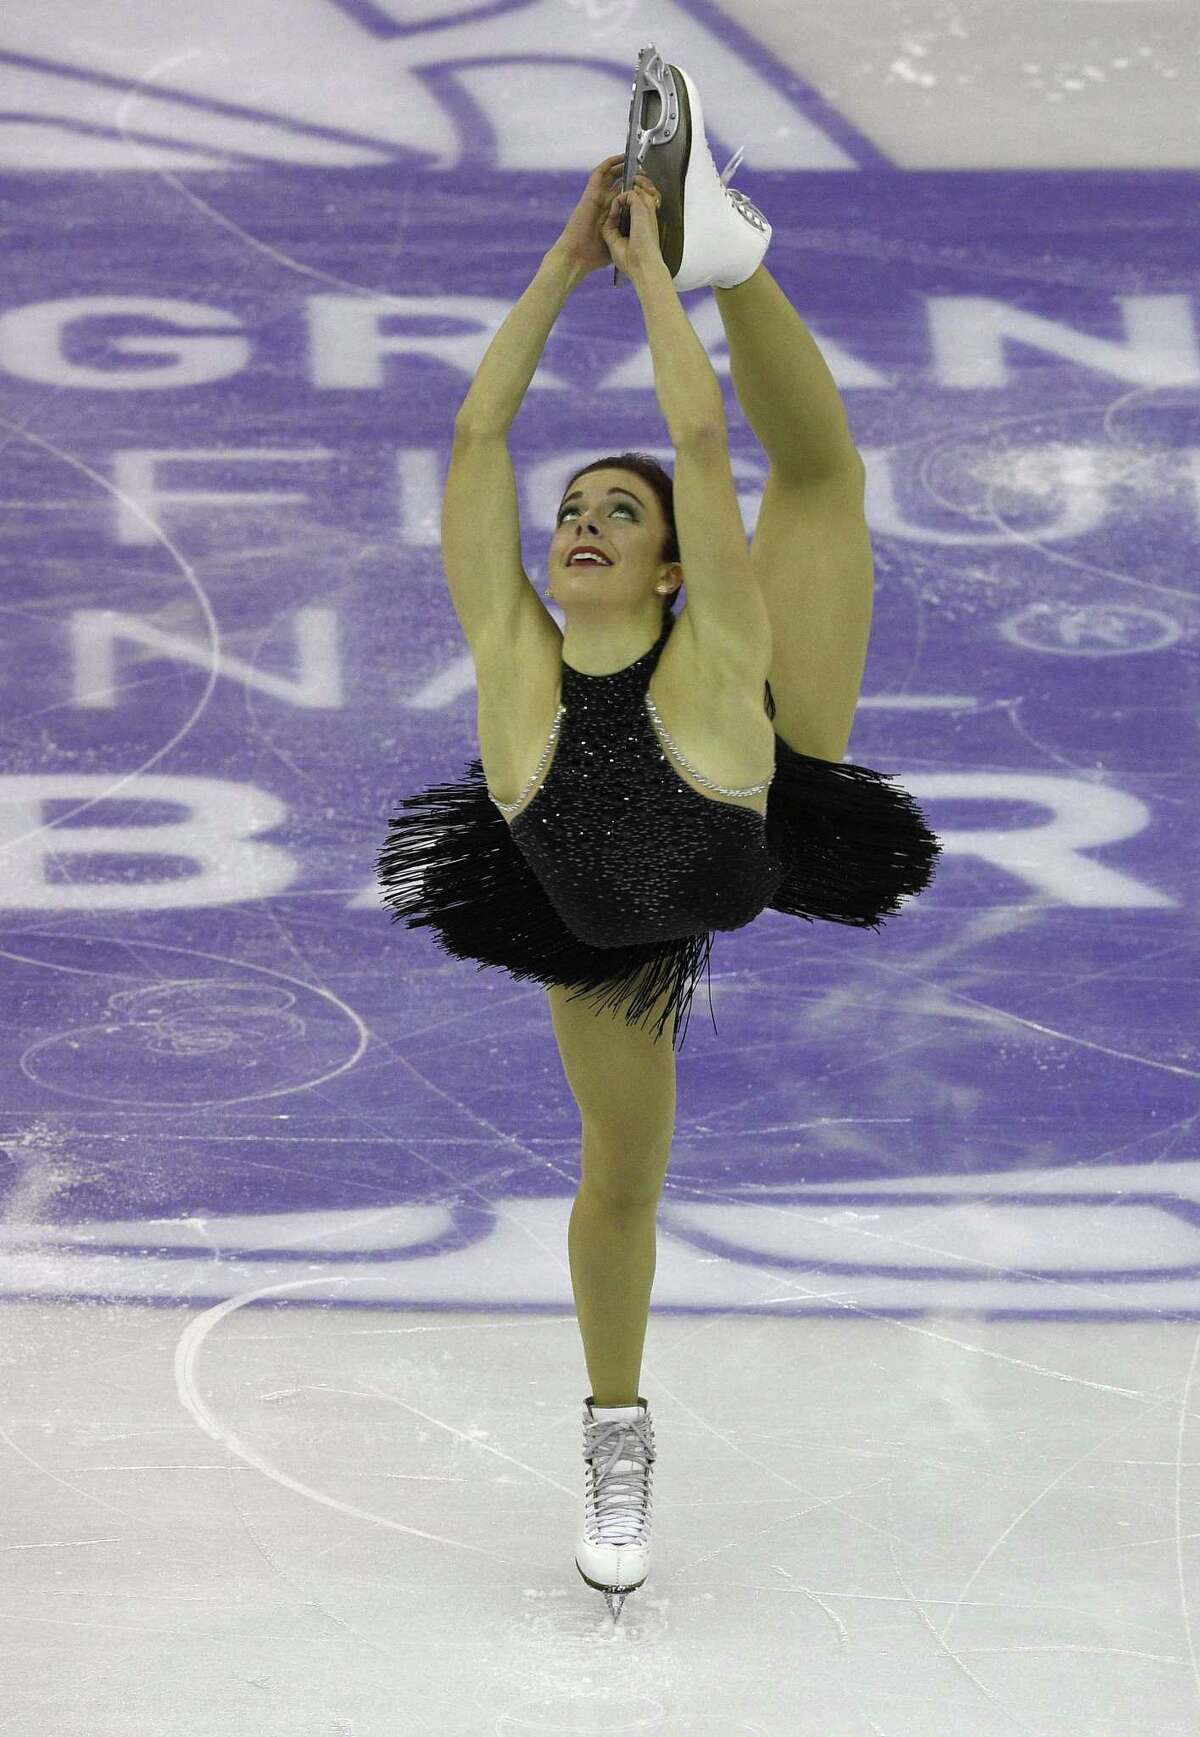 US Ashley Wagner competes during Ladies Short program at the ISU Grand Prix of Figure Skating Final 2015 in Barcelona on December 11, 2015. AFP PHOTO / LLUIS GENELLUIS GENE/AFP/Getty Images